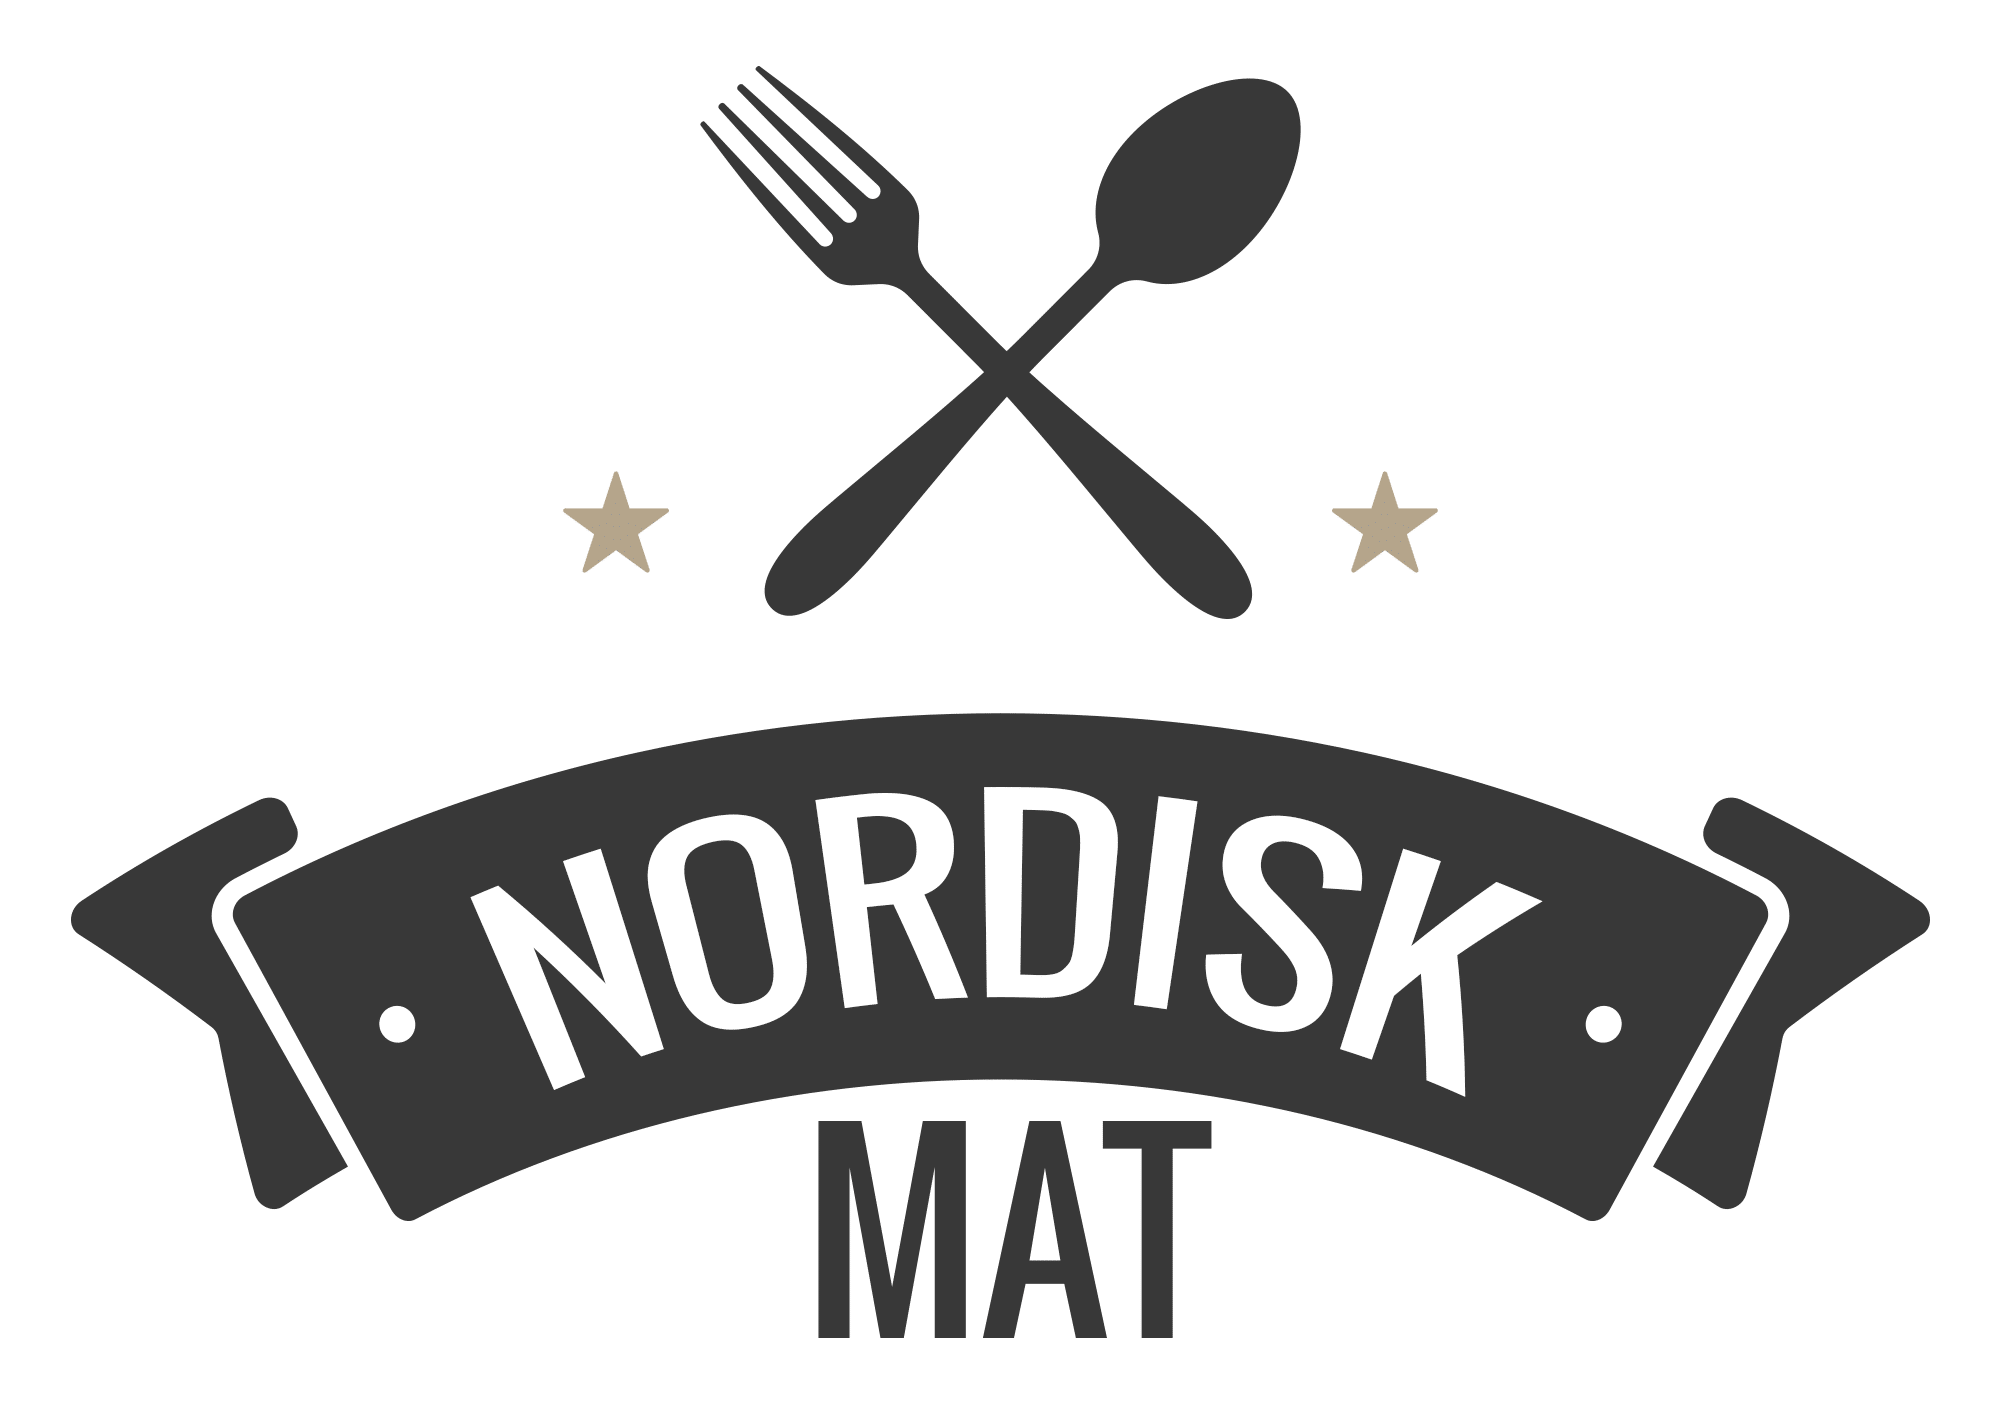 Nordisk Mat